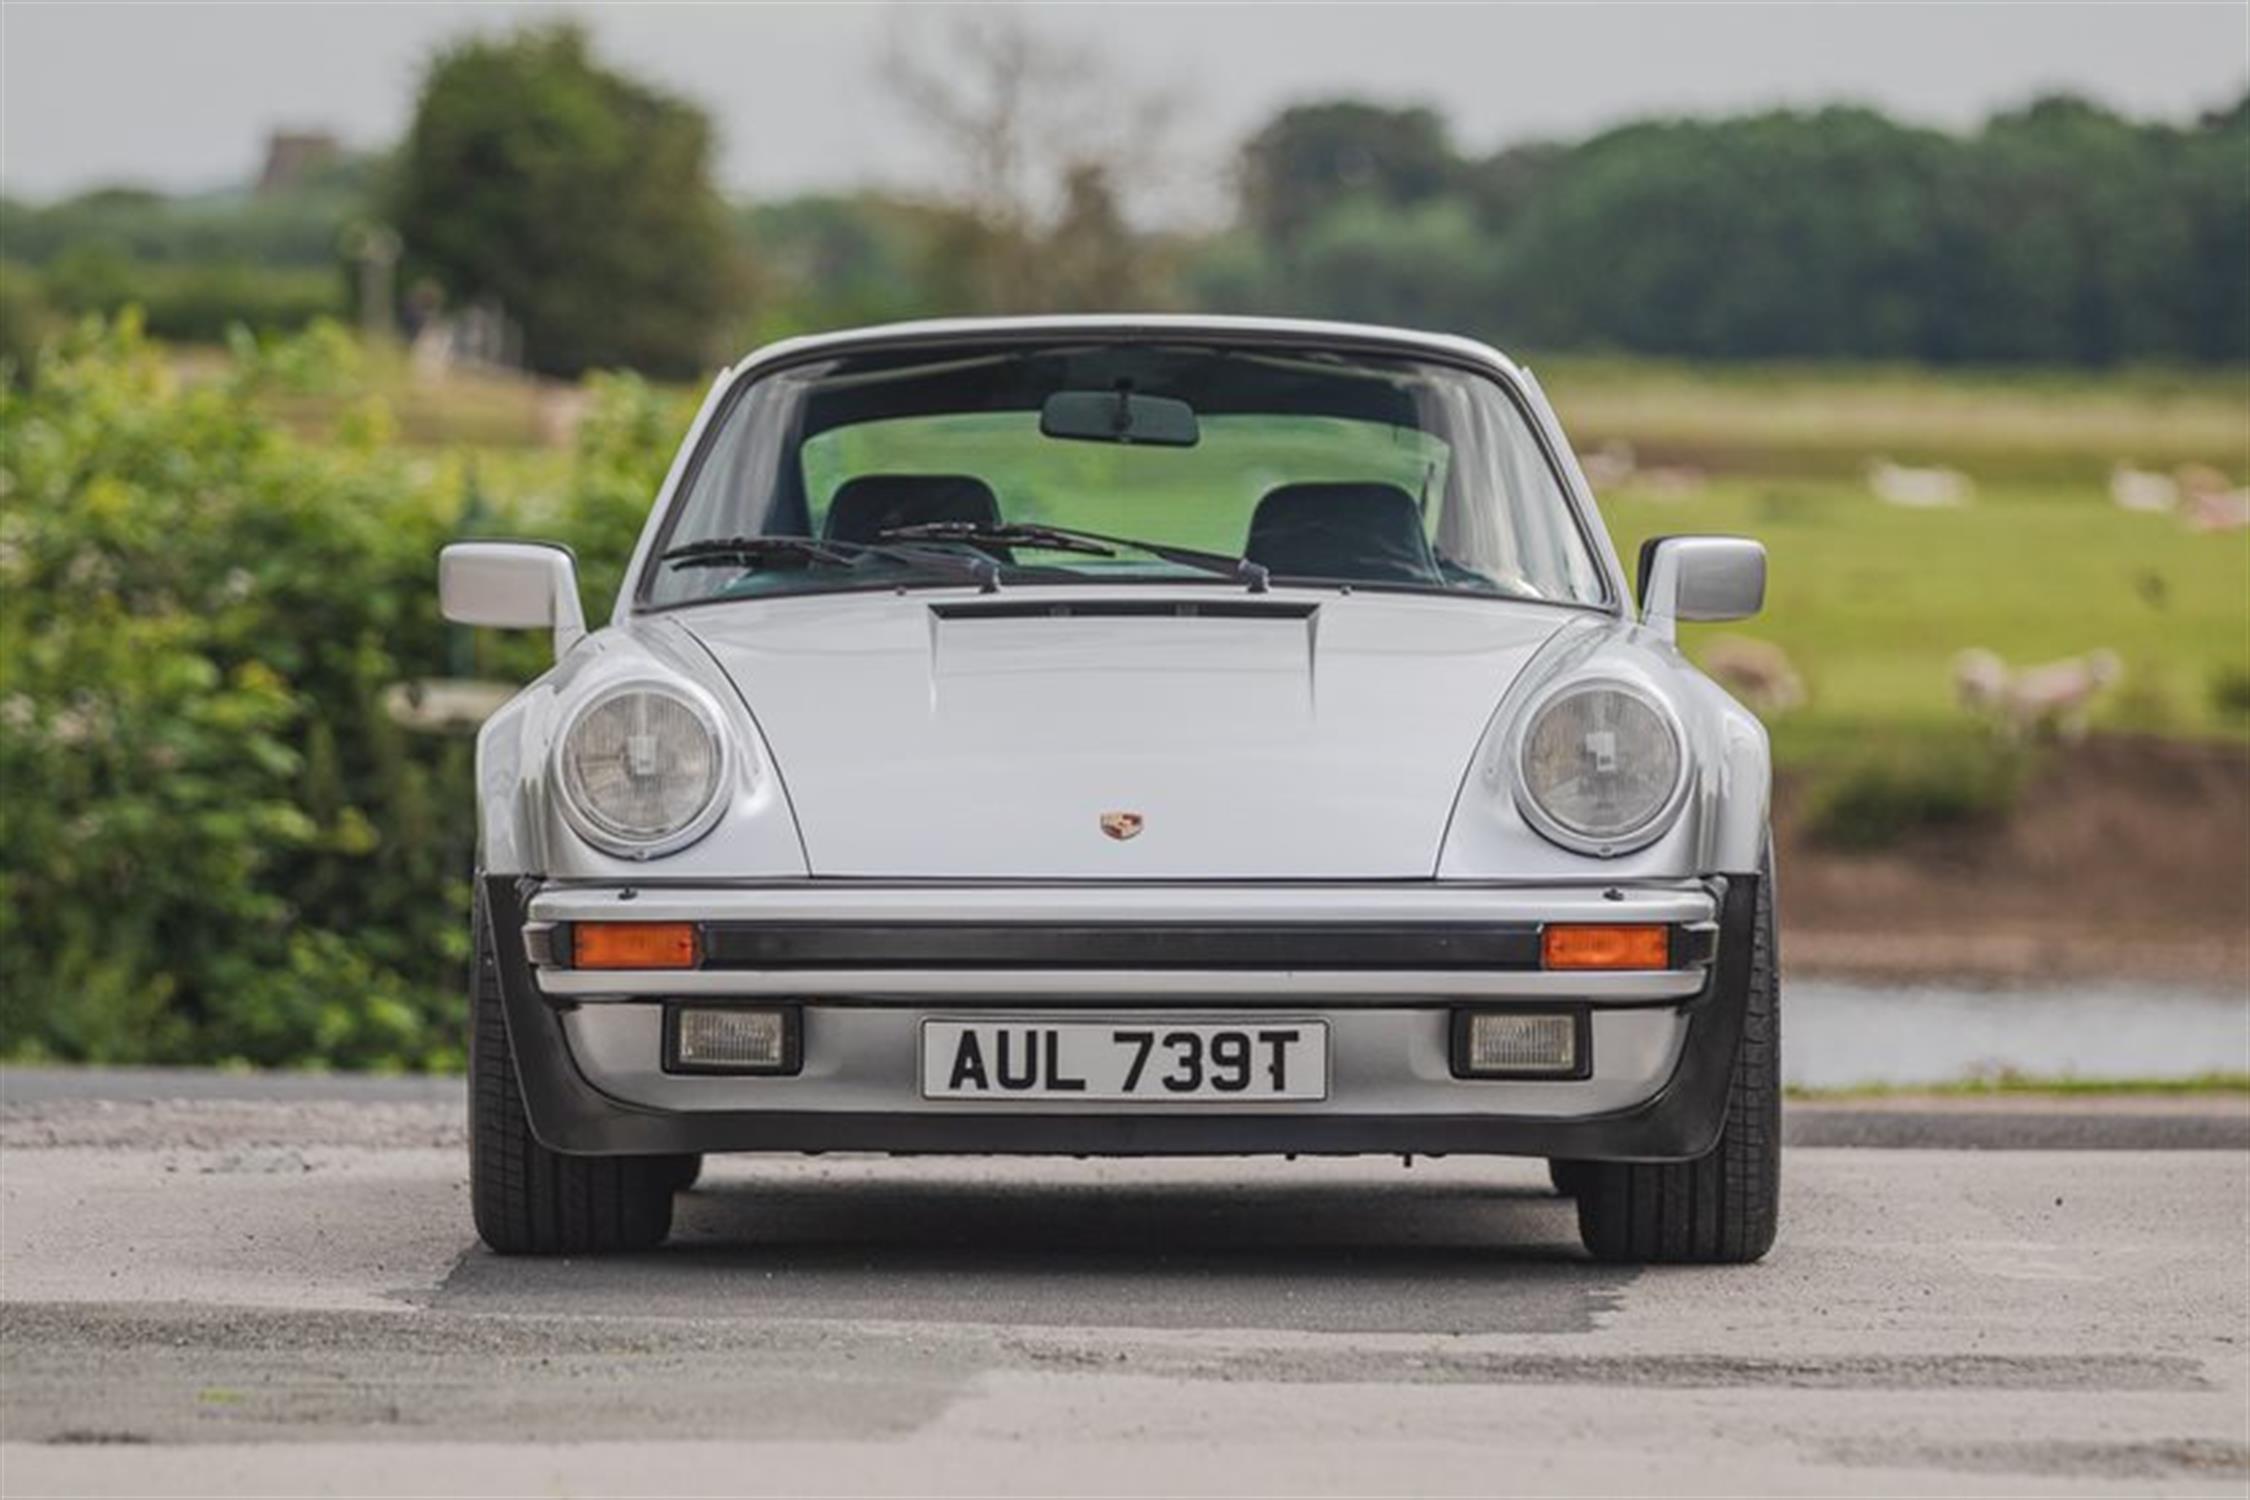 1979 Porsche 911 Turbo 3.3-Litre - Image 6 of 10